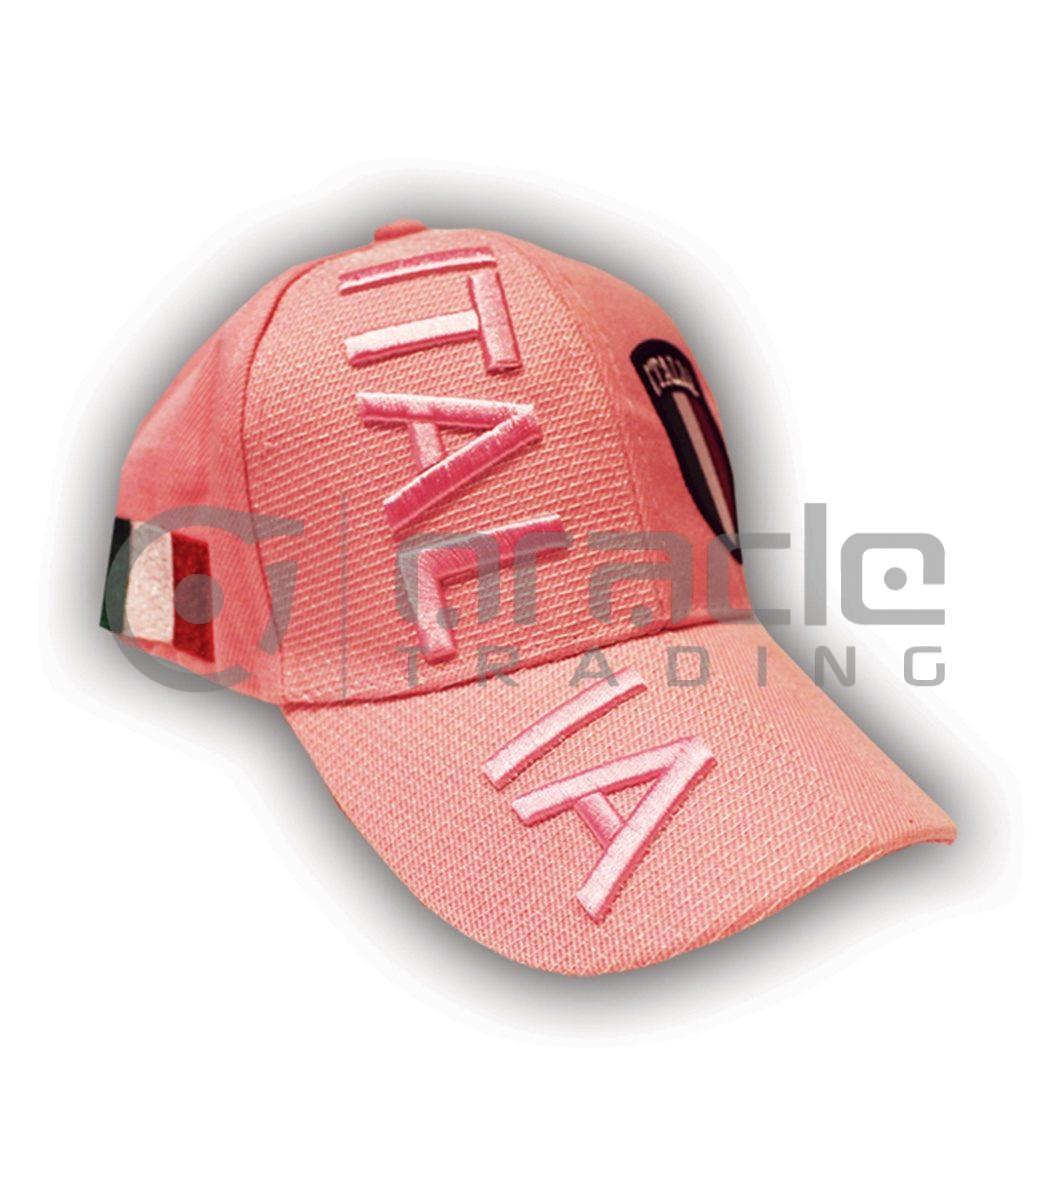 3D Italia Hat - Pink